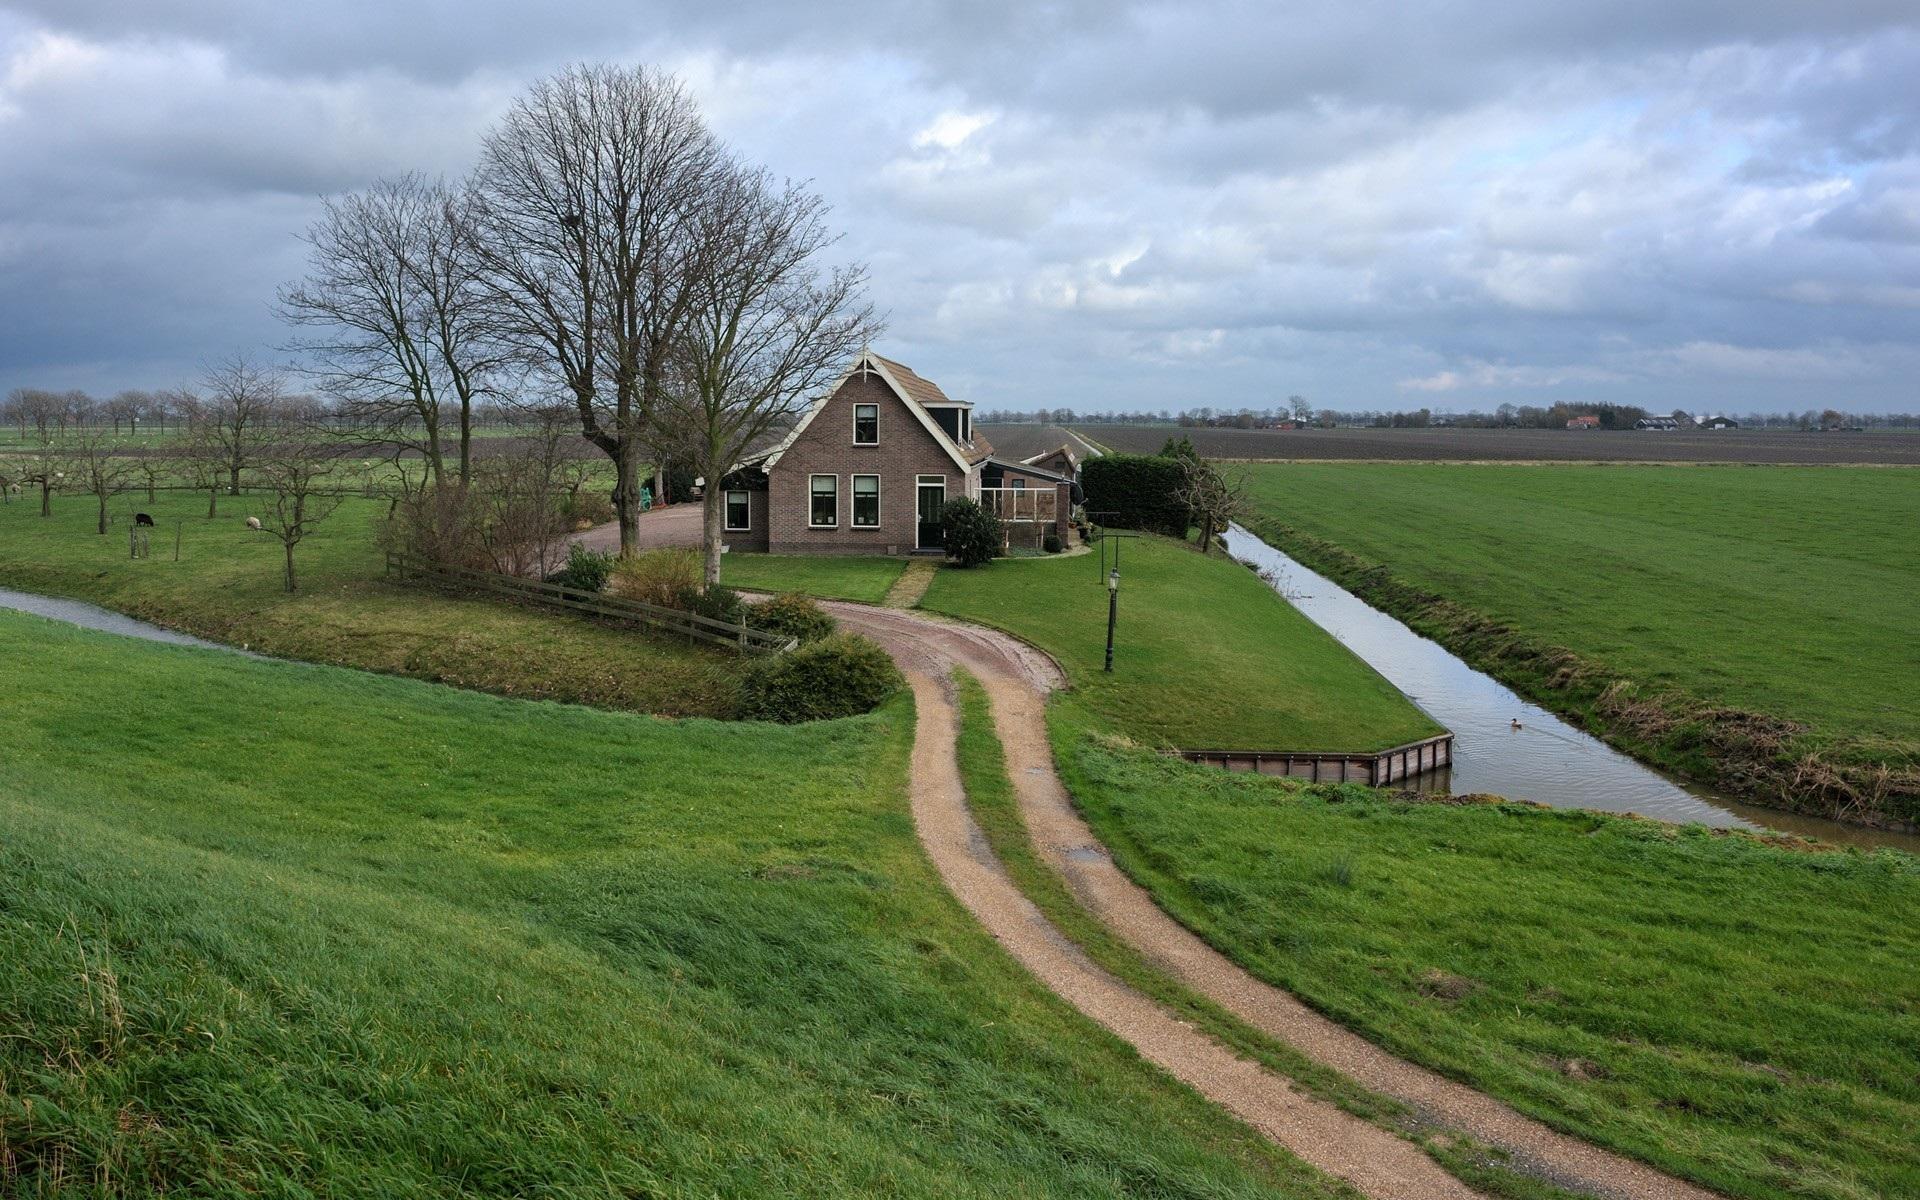 Farm House Wallpaper Hd   1436478 1920x1200